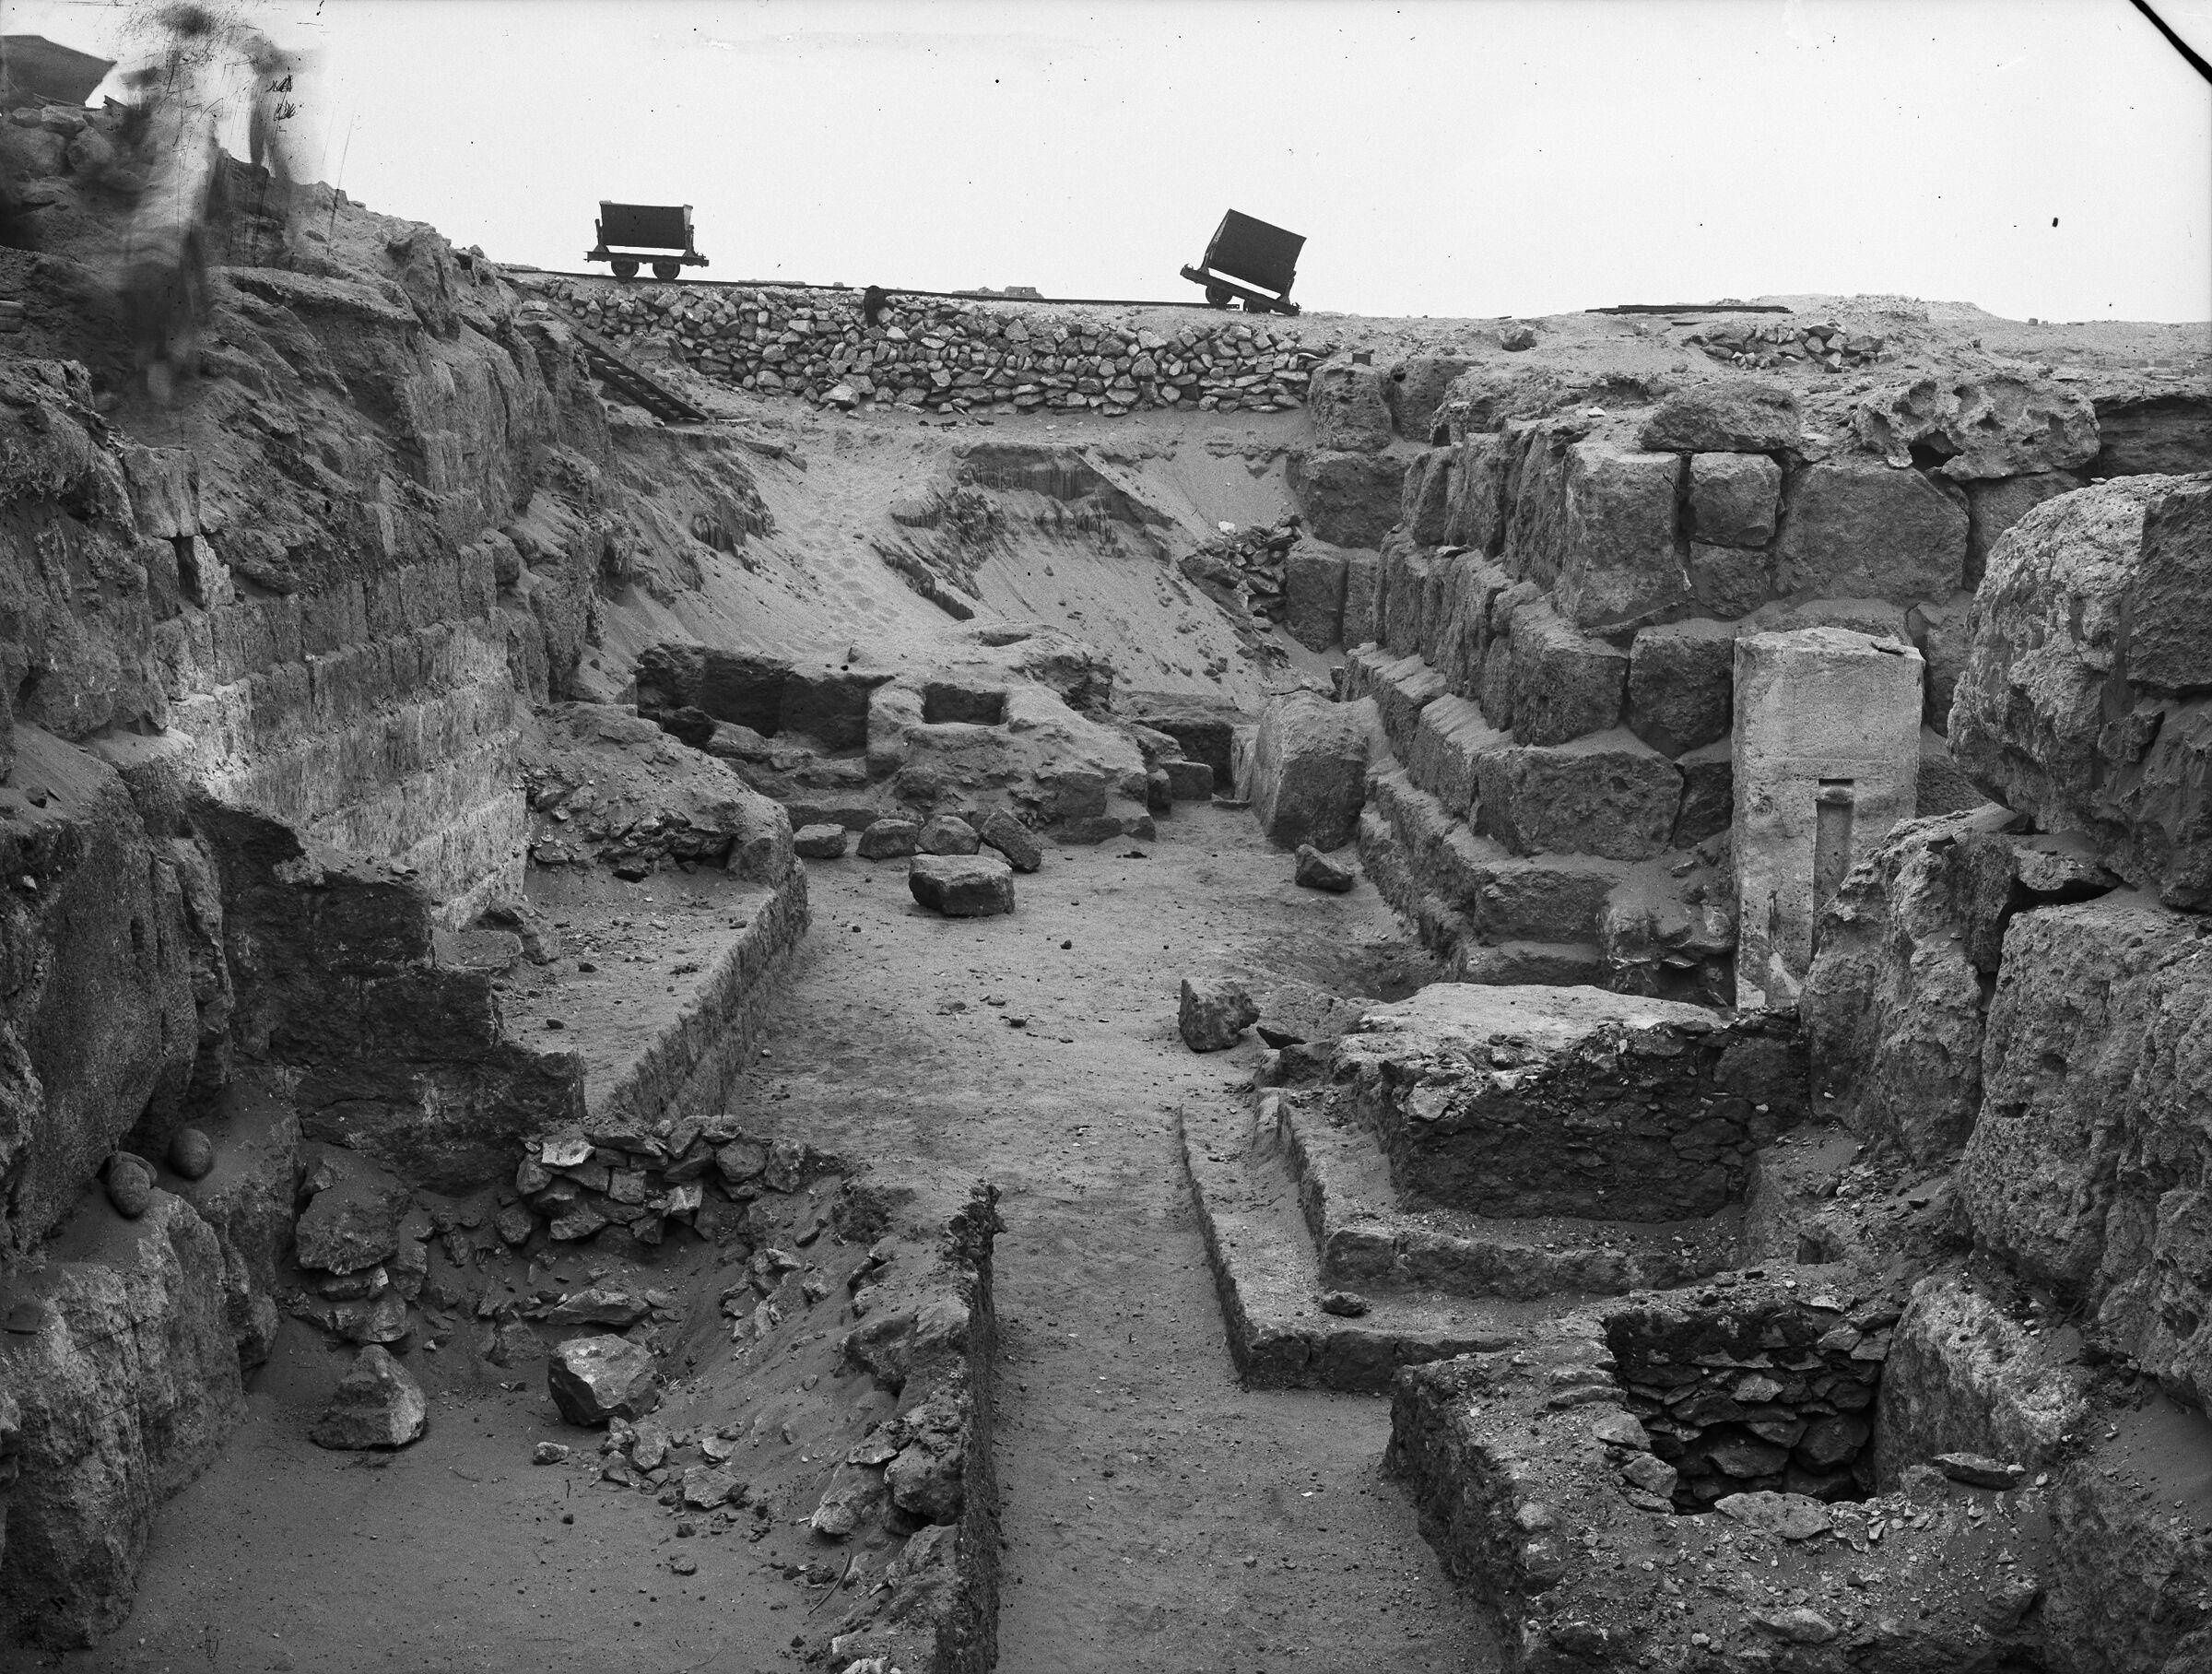 Western Cemetery: Site: Giza; View: G 4730, G 4740, G 4731, G 4641, G 4640, G 4633+4634